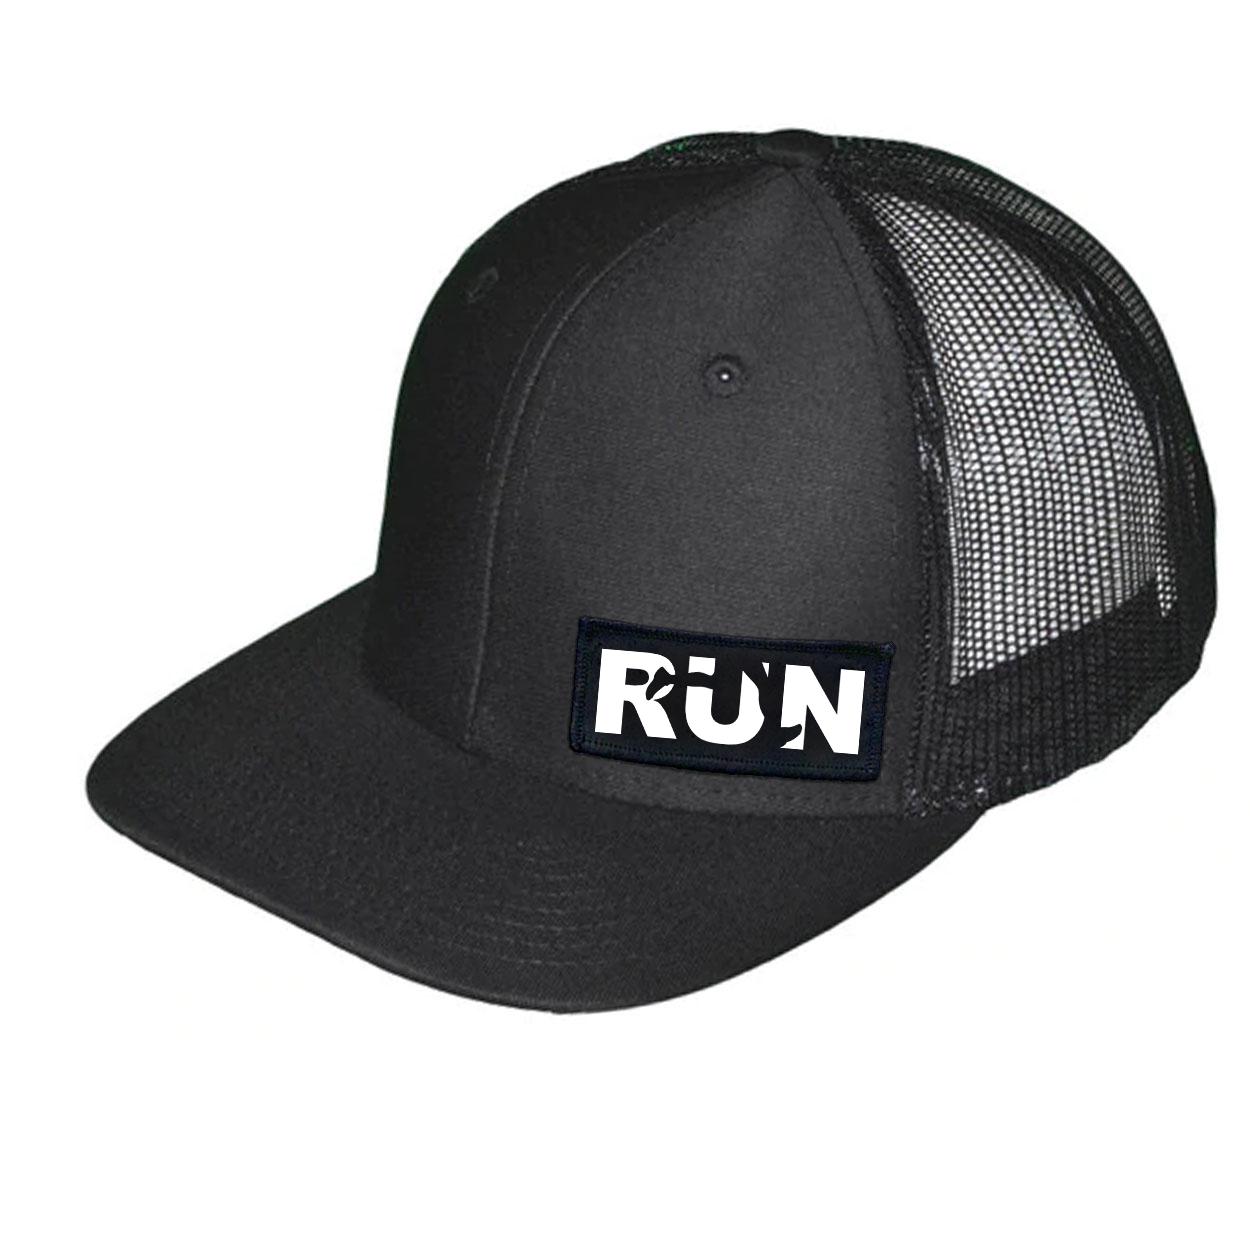 Run Jog Logo Night Out Woven Patch Snapback Trucker Hat Black (White Logo)